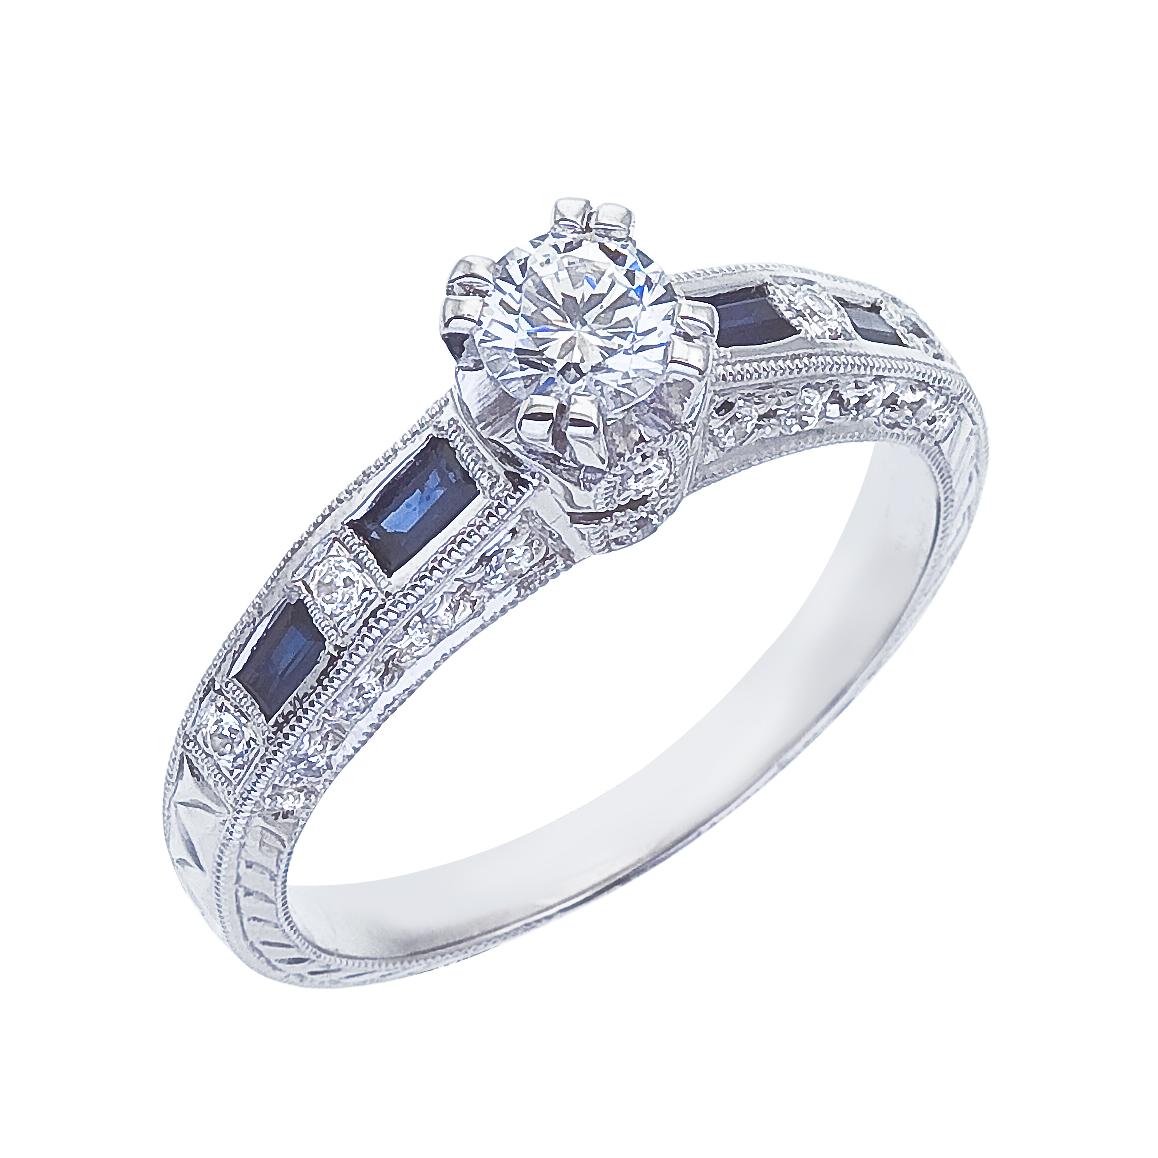 14k White gold Classic Diamond QPID Engagement Ring (0.47 tcw)